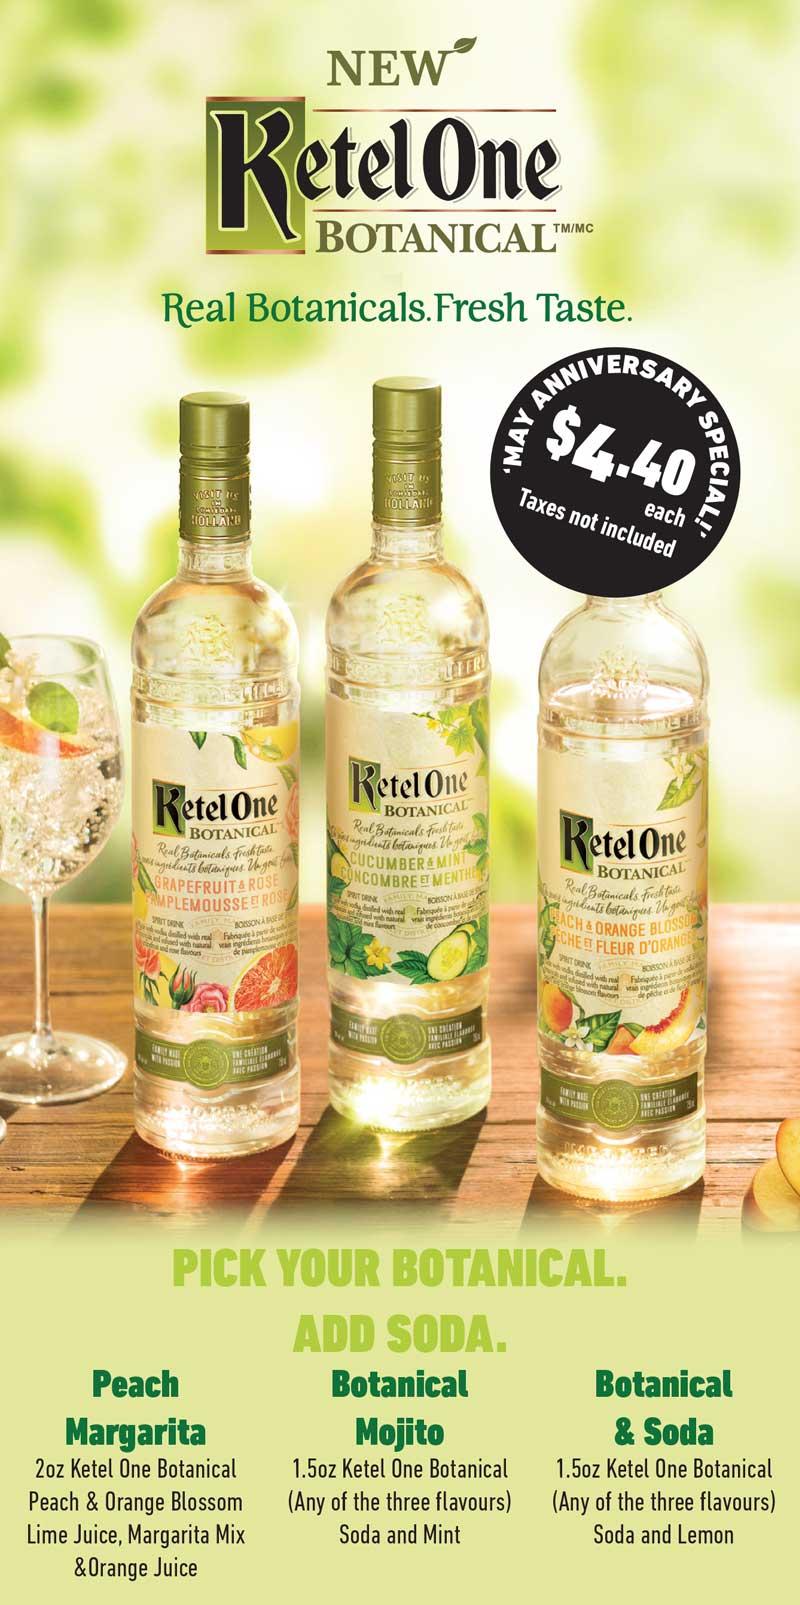 KetelOne Botanical May Special